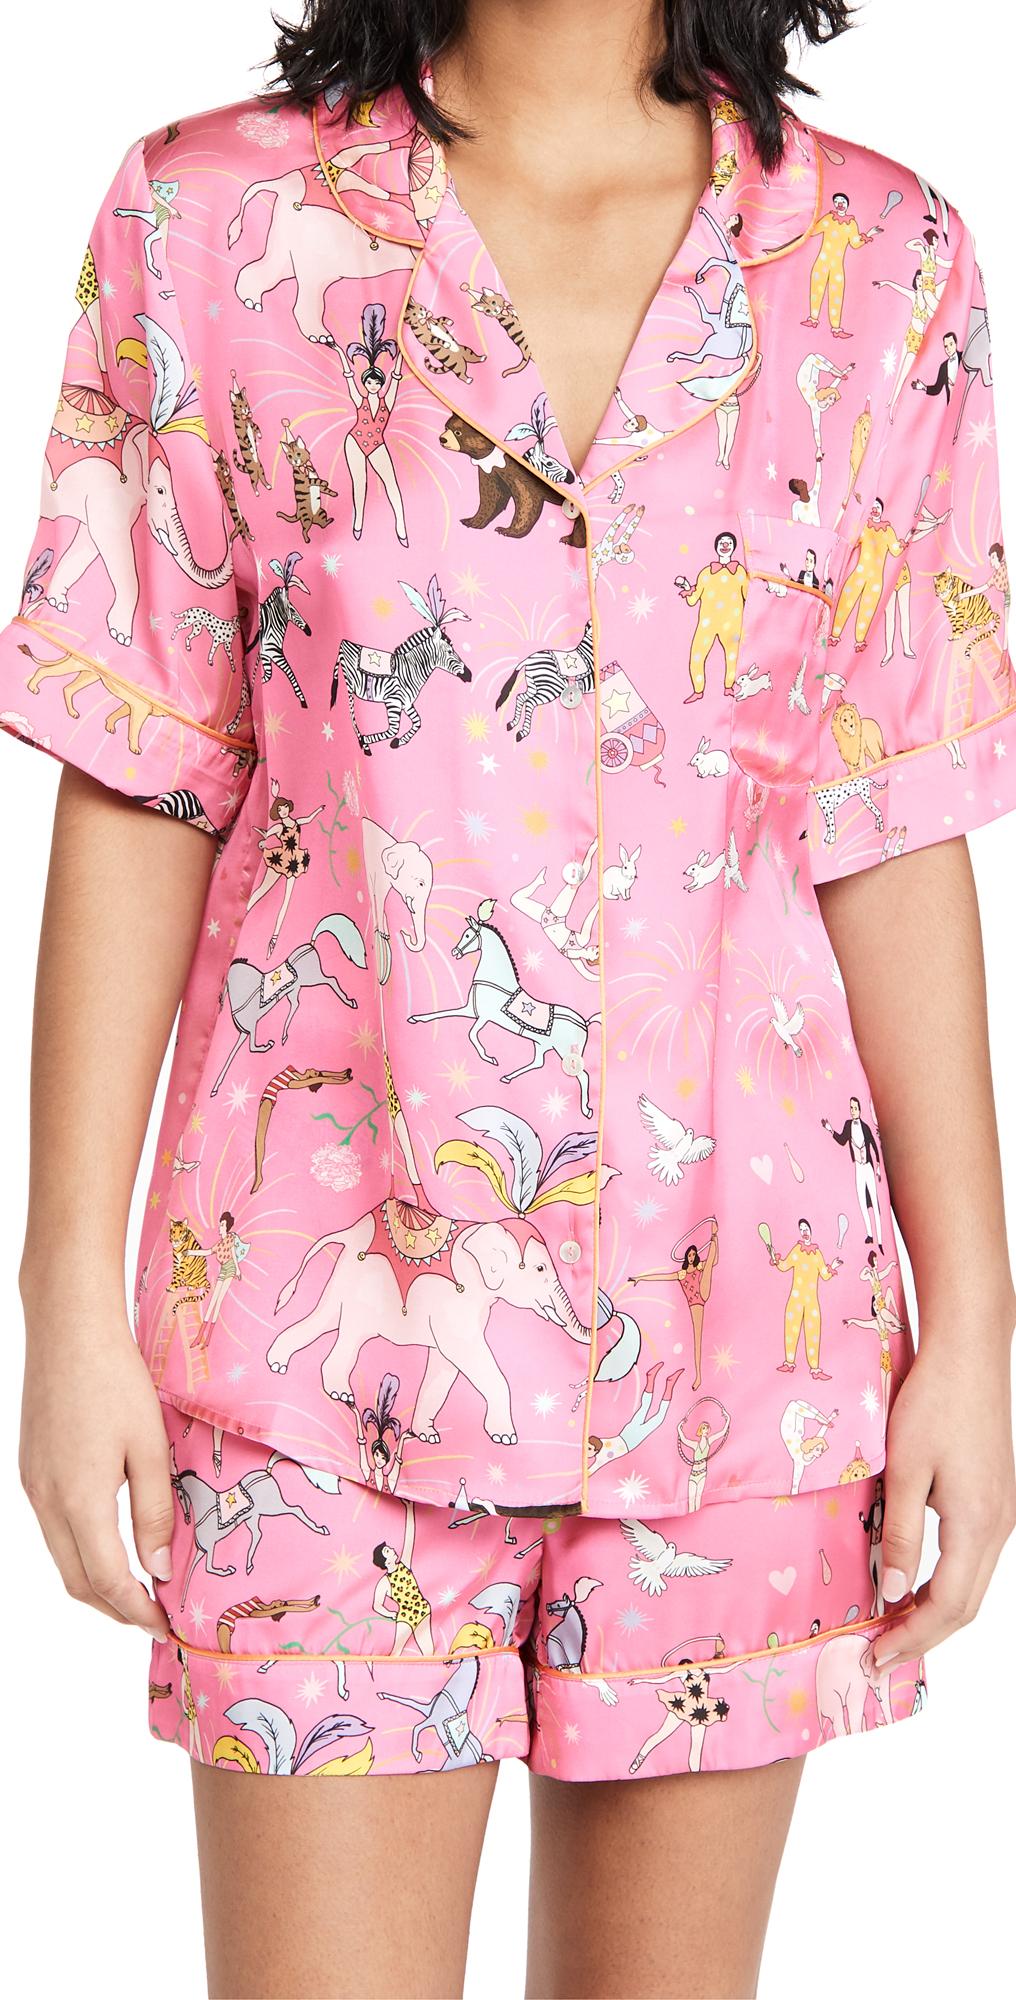 Circus Shorts Pajama Set